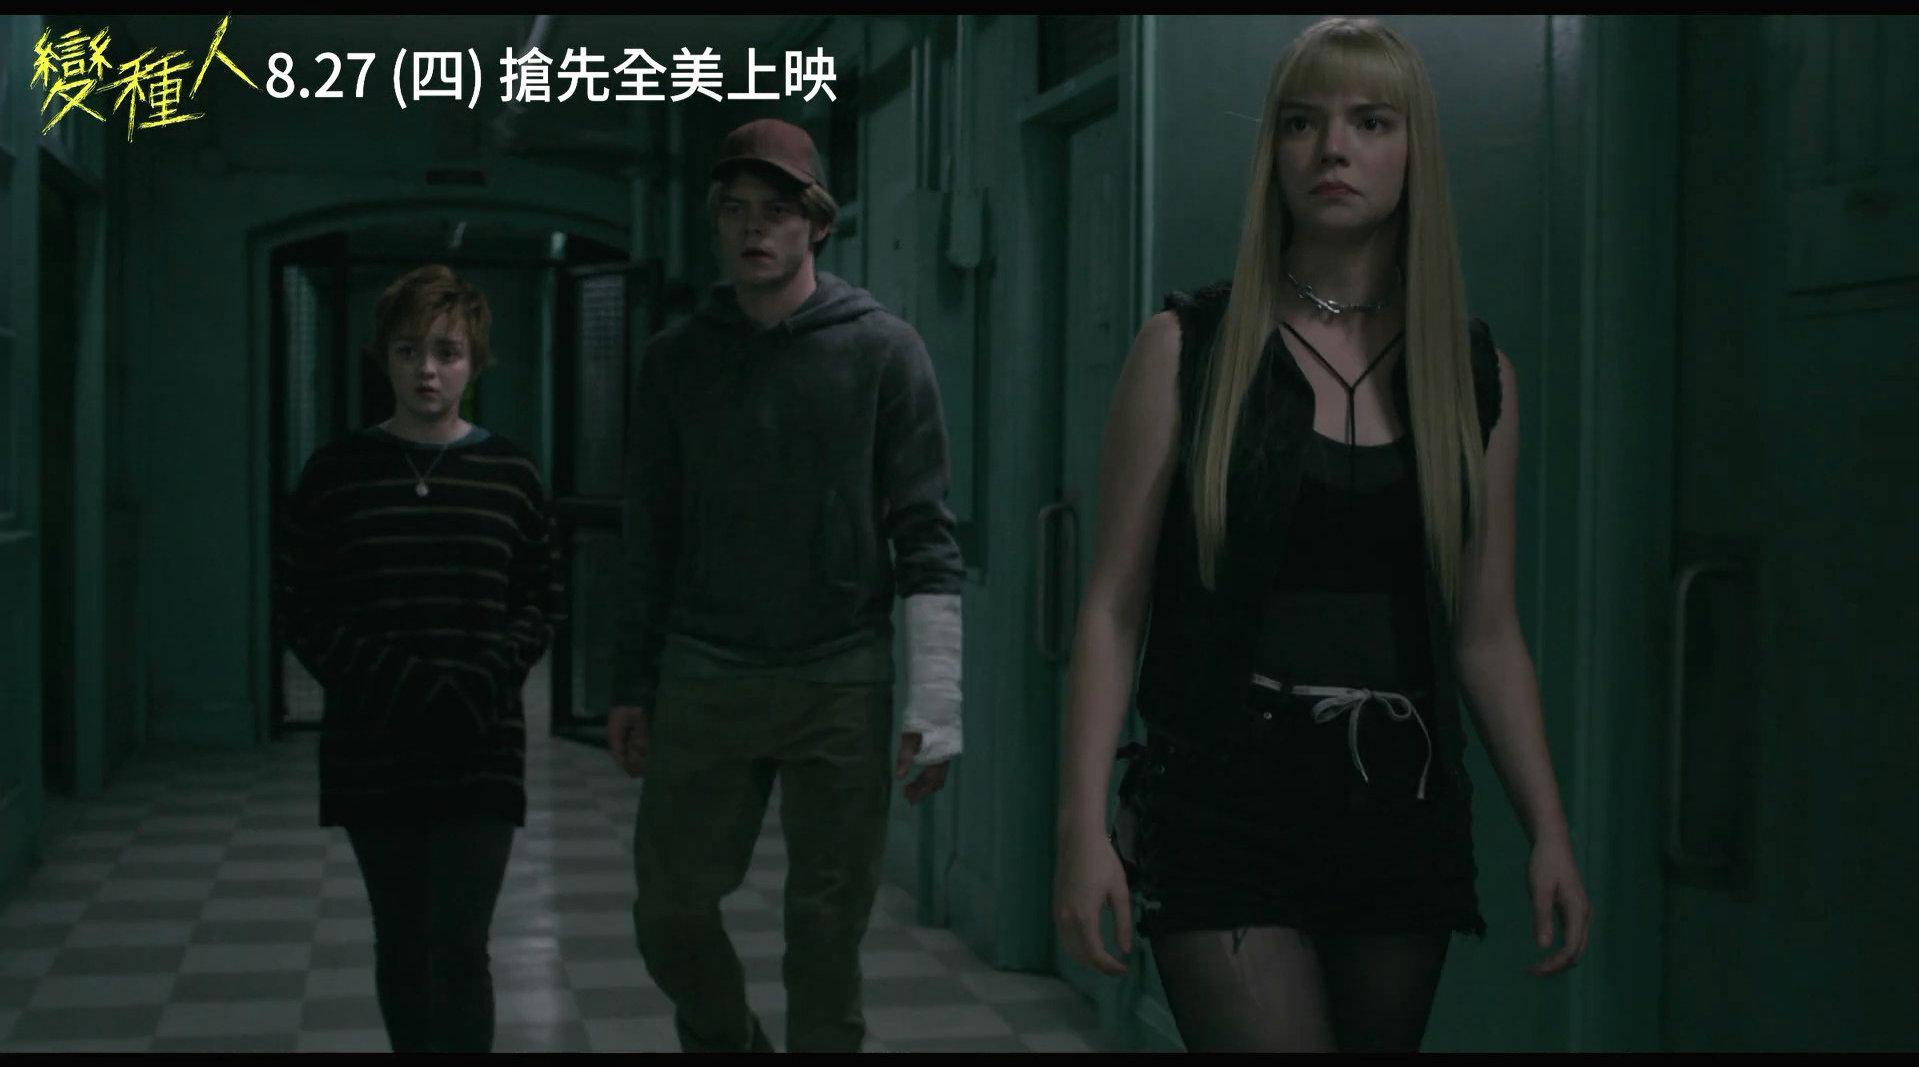 X战警系列一波N折新作中国台湾定档8月27日抢先北美一天公映!